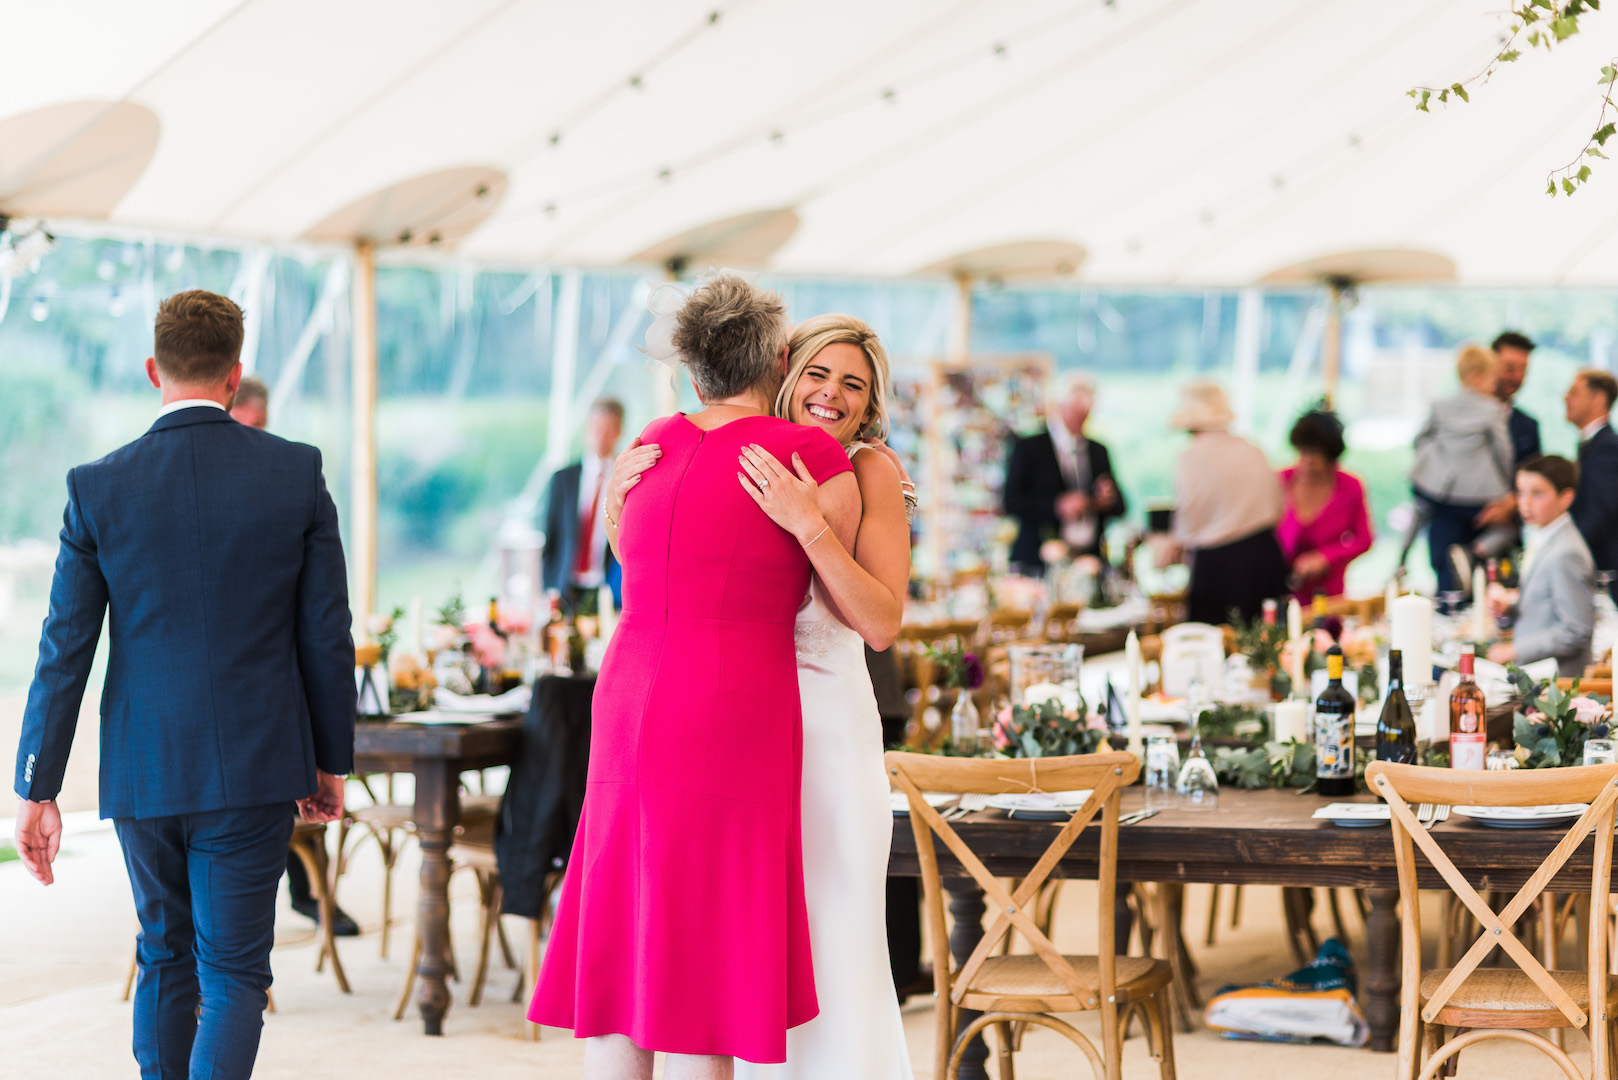 Sarah and Joe's PapaKata Sperry Wedding: Bride welcoming guests